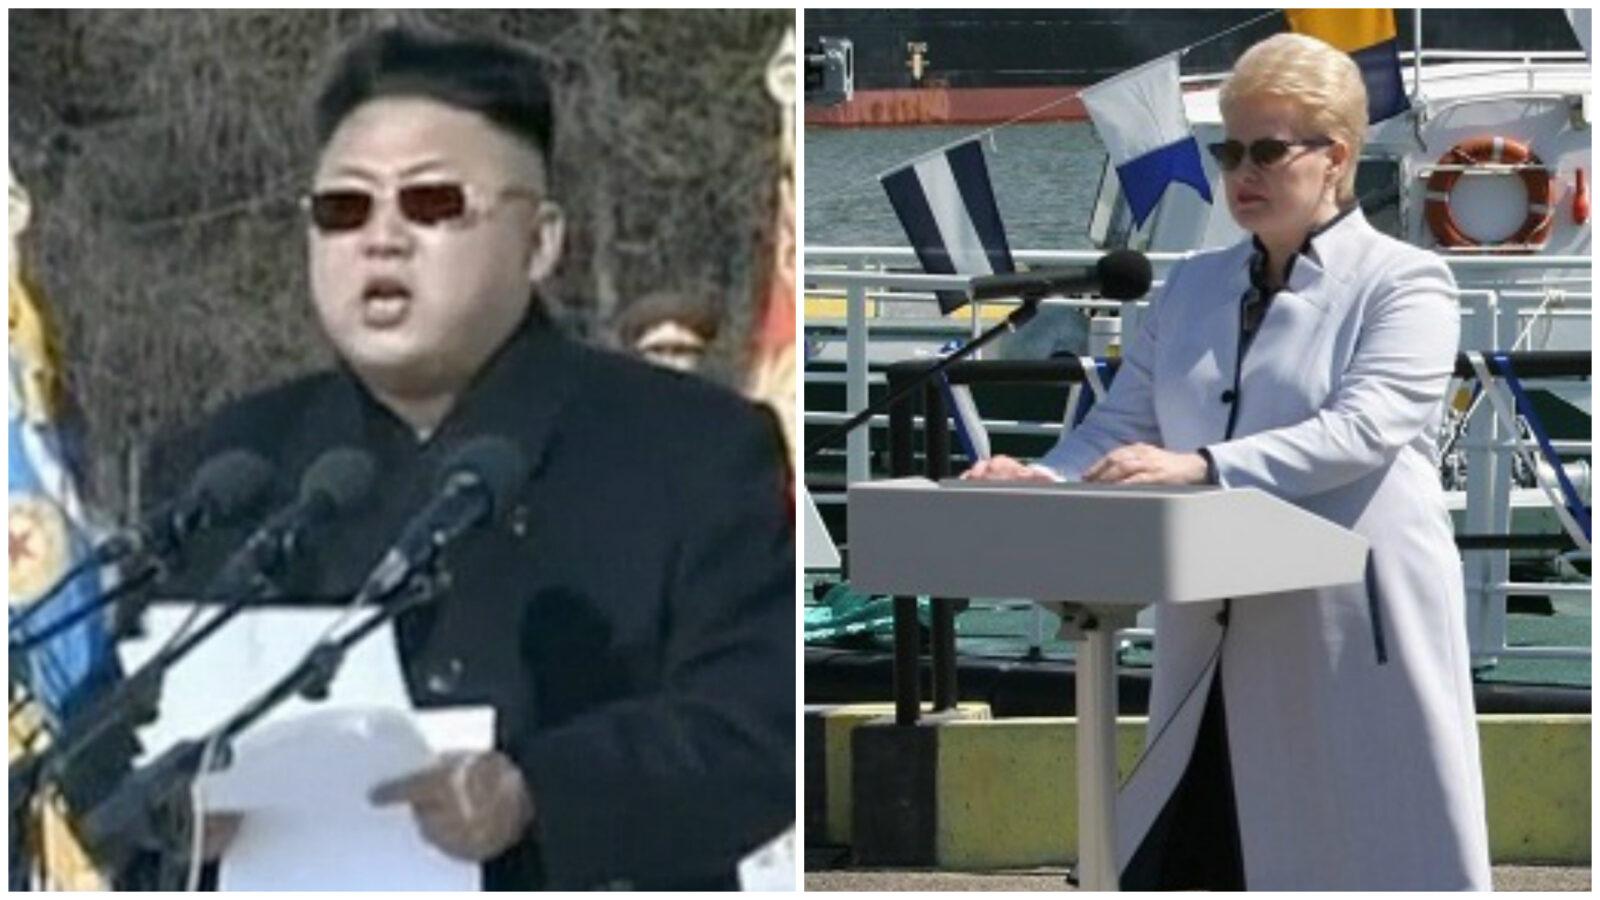 Lietuva vejasi Šiaurės Korėją